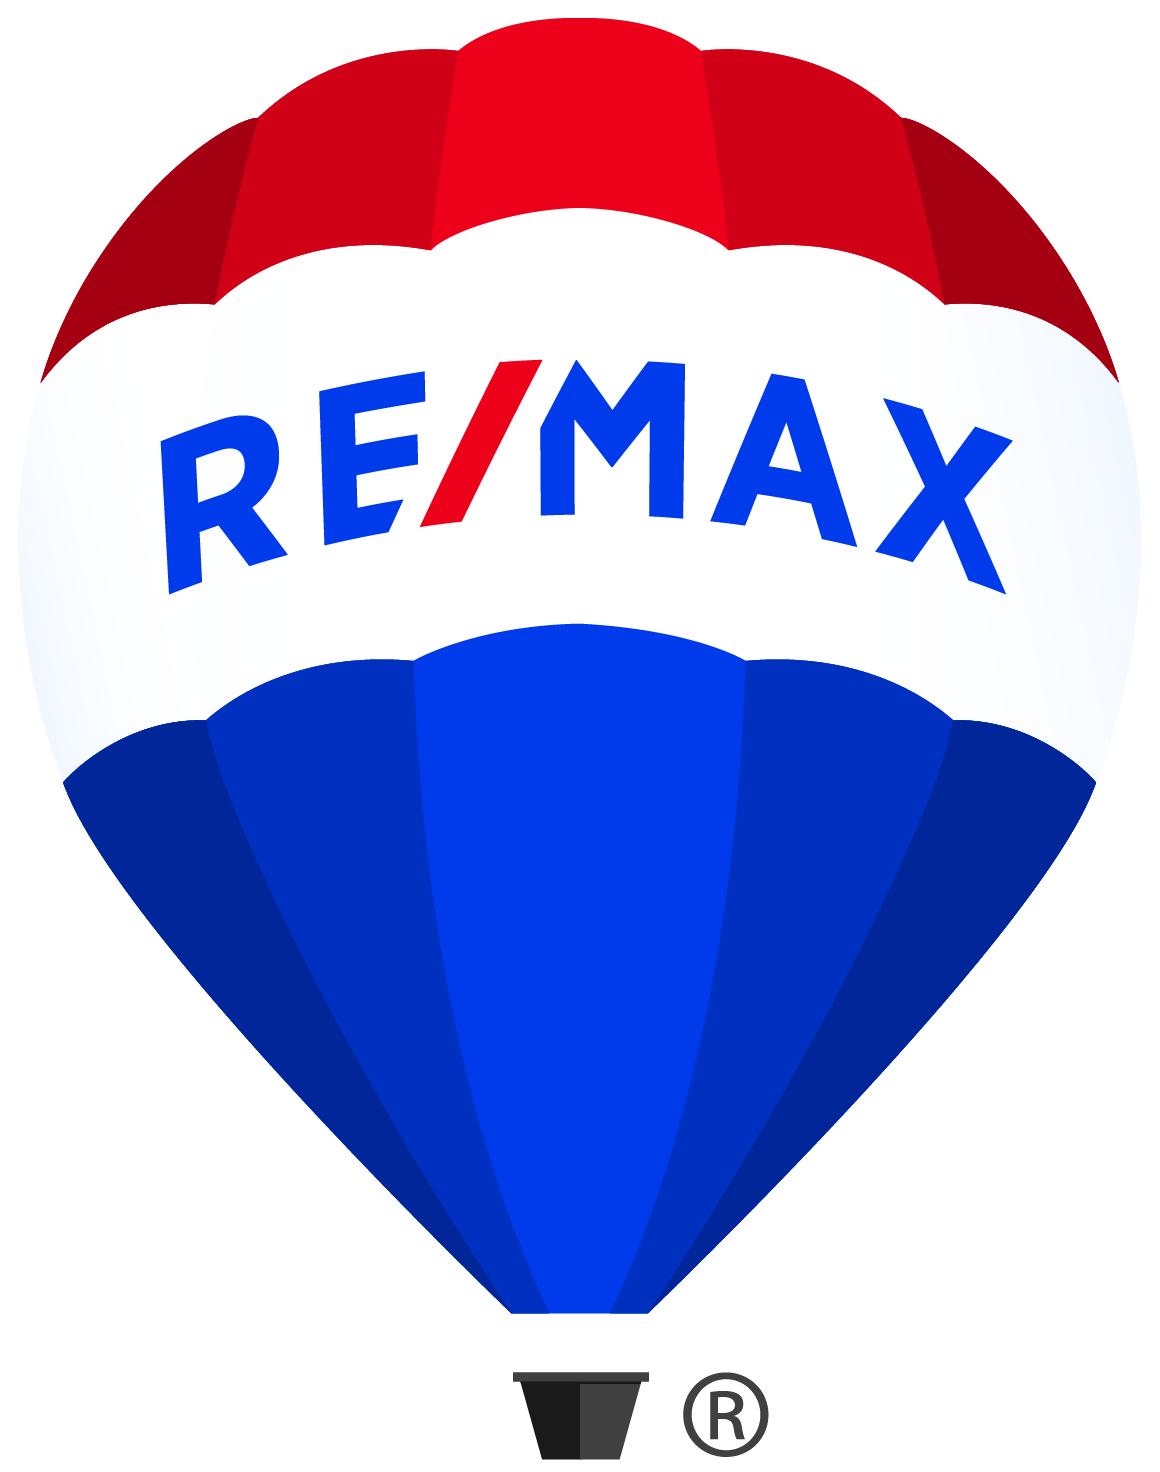 2remax-balloon-high-resolution.jpg